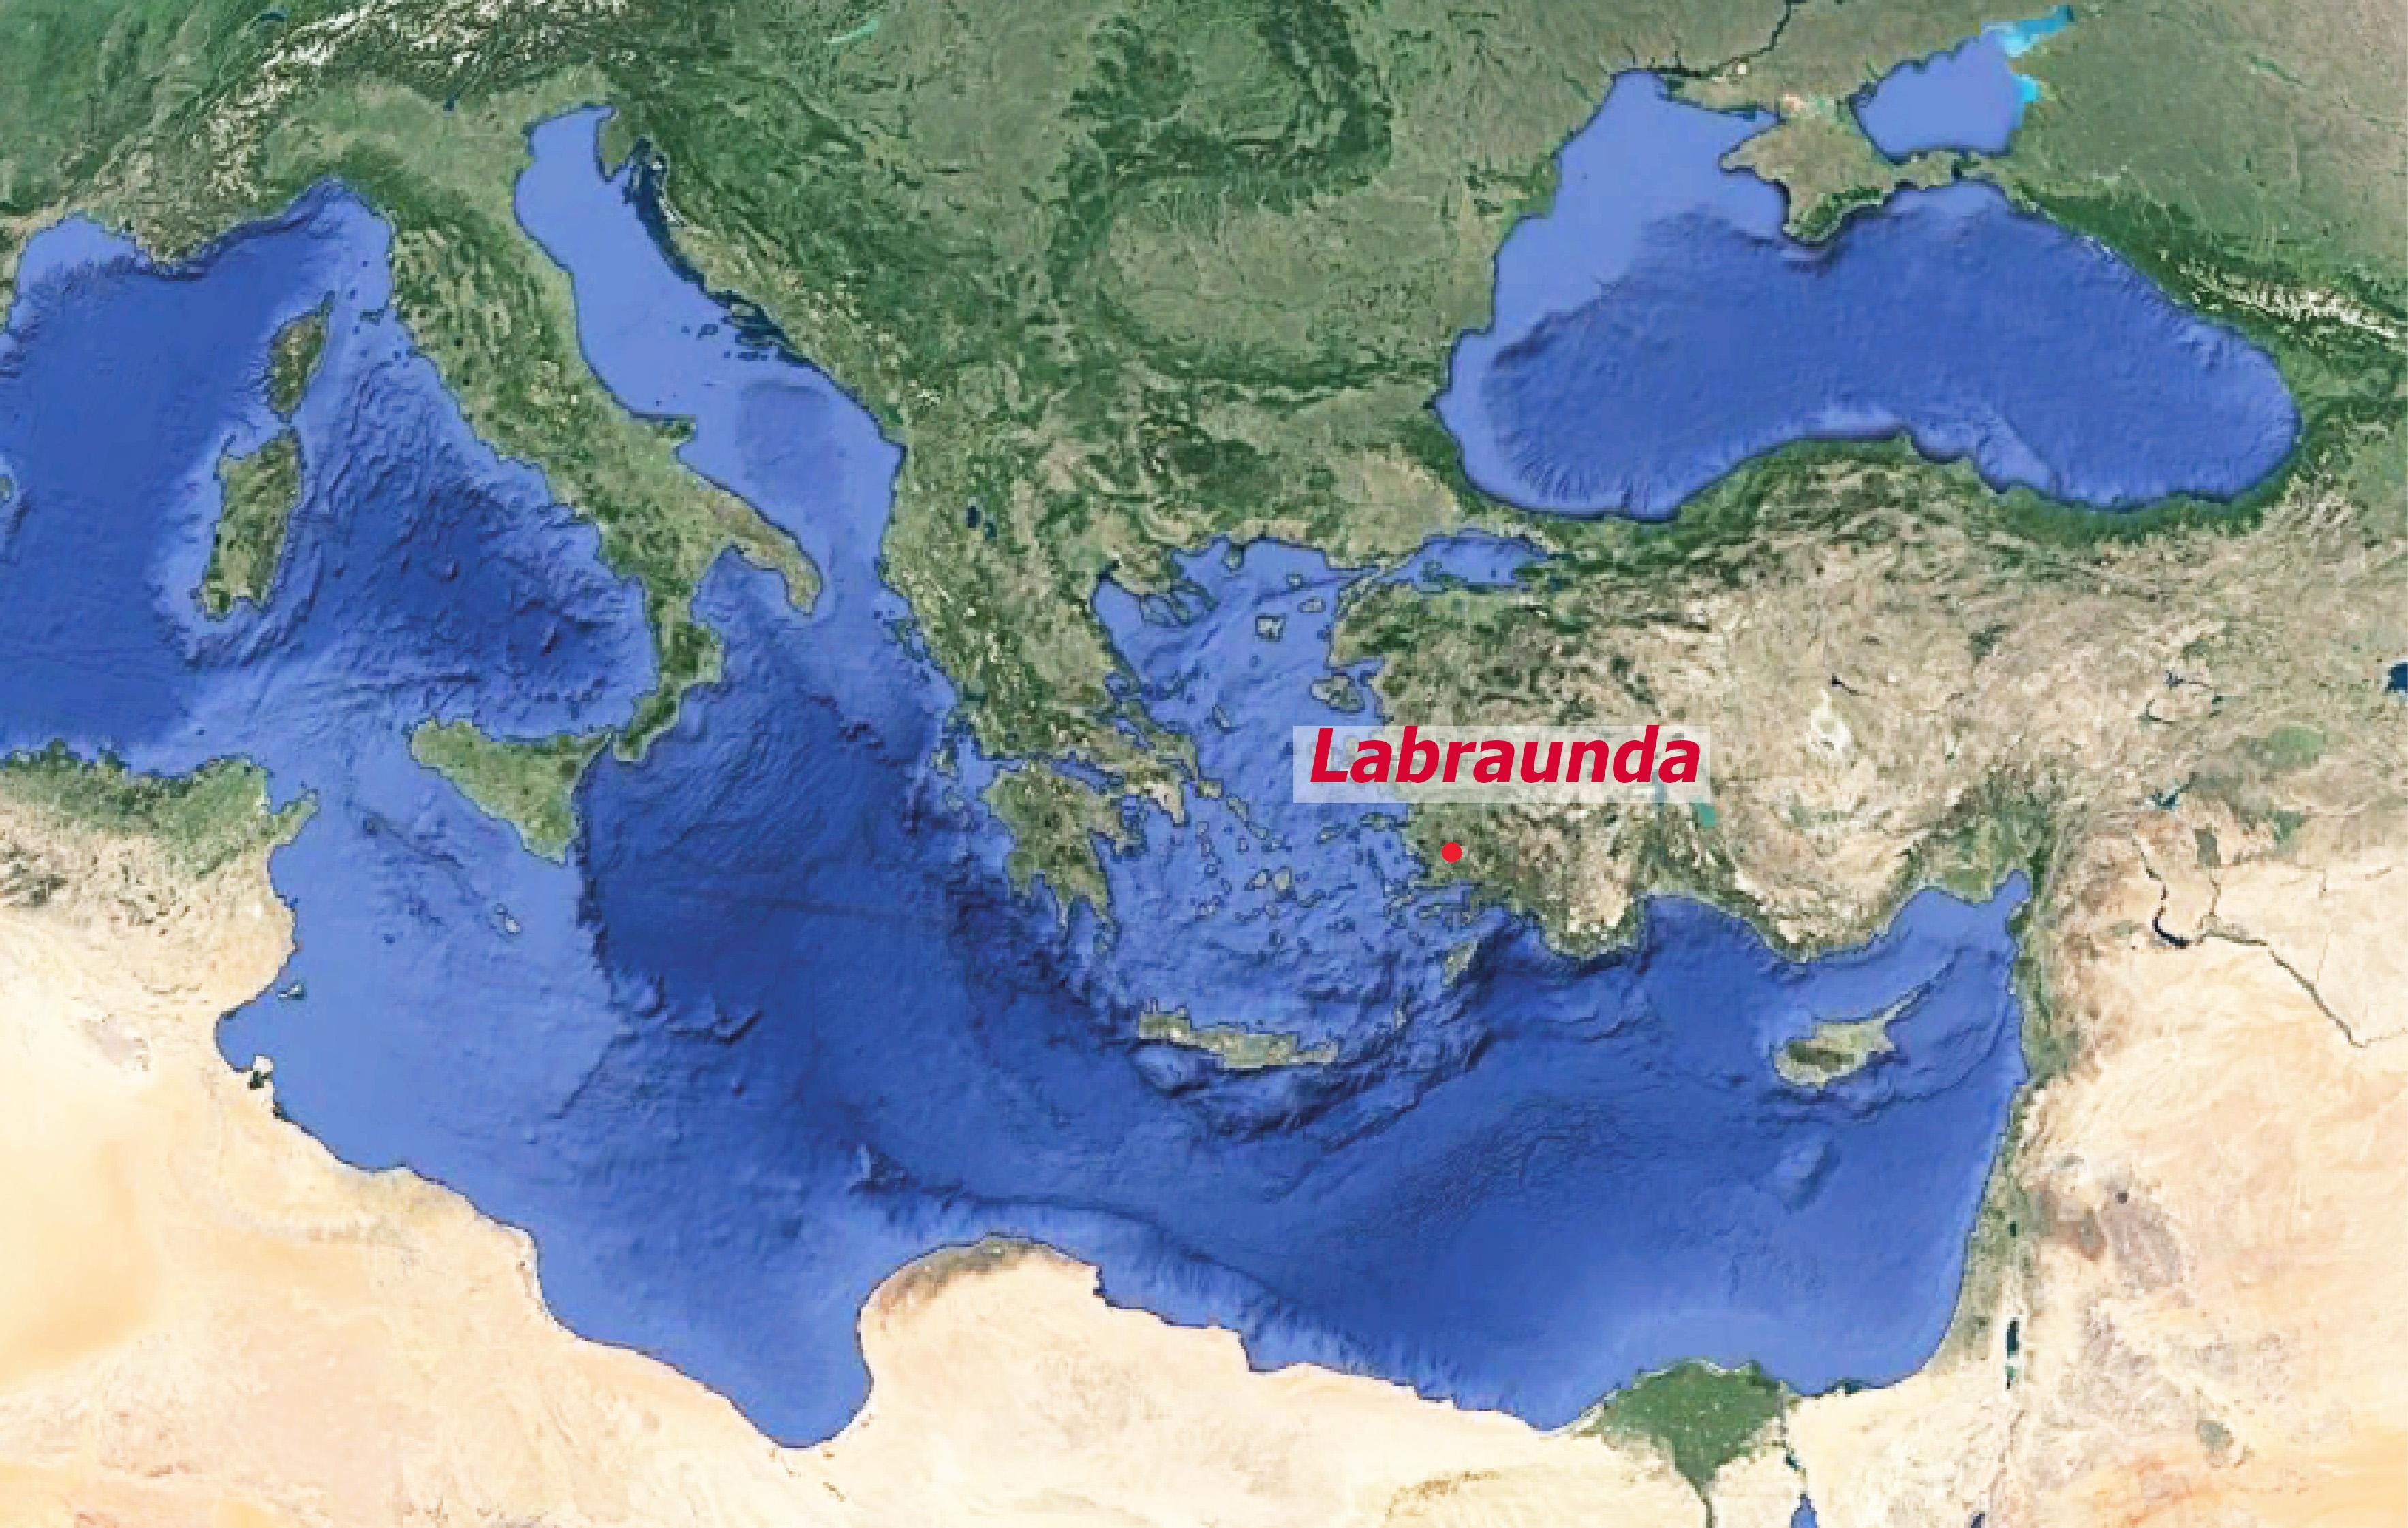 psl_psl-explore-labraunda_carte_mediterranee